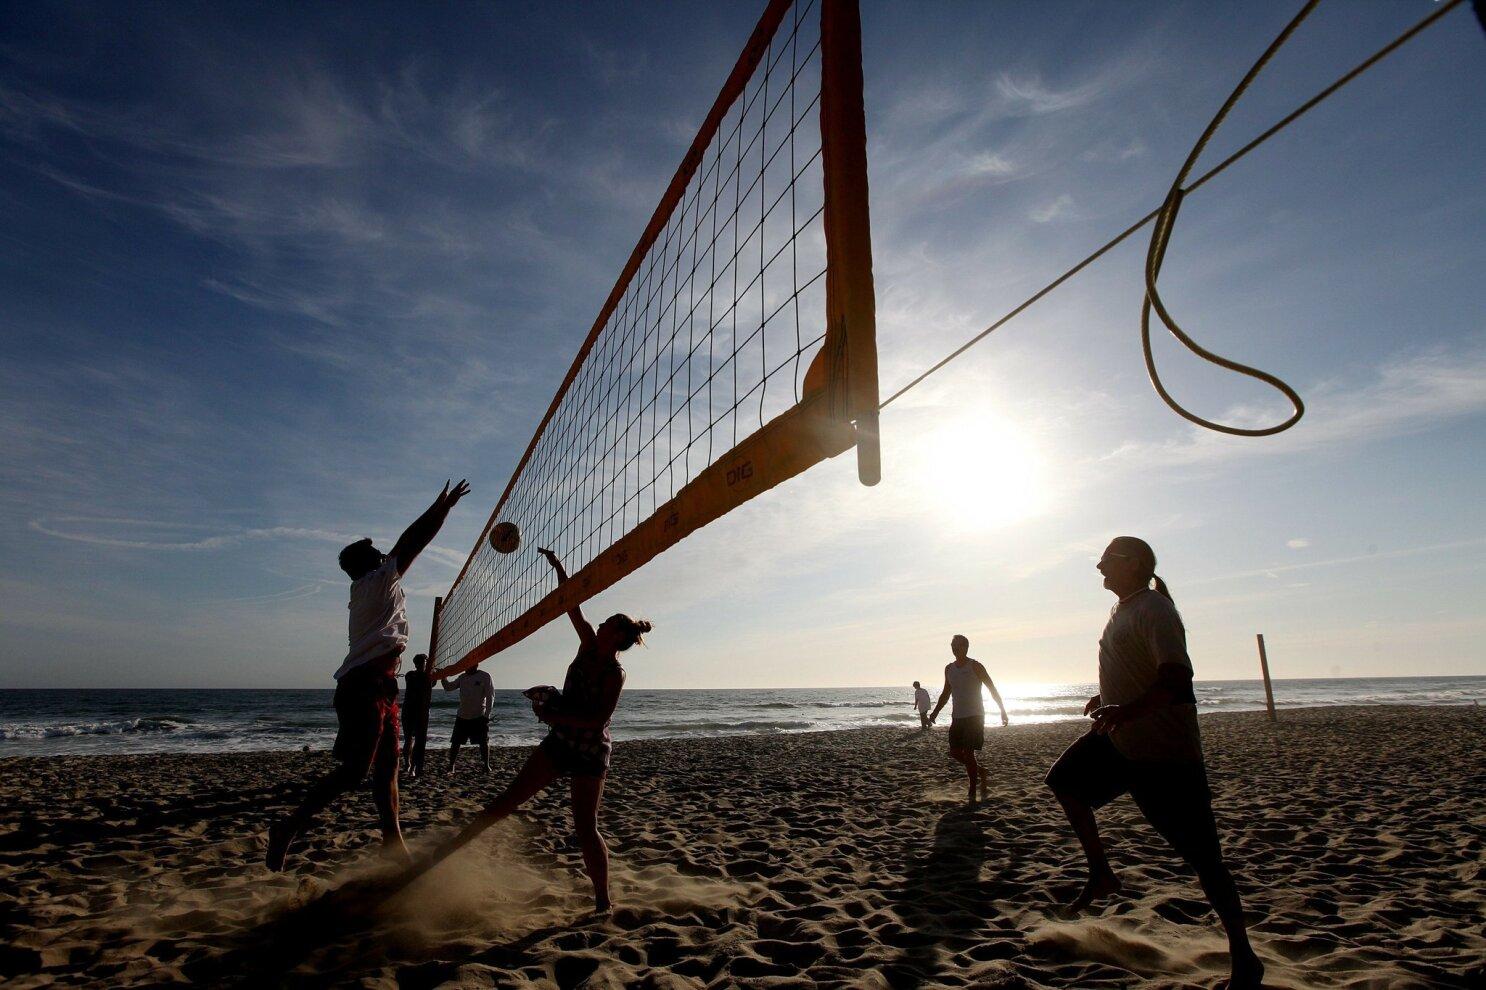 Beach Volleyball Club Nets Controversy The San Diego Union Tribune